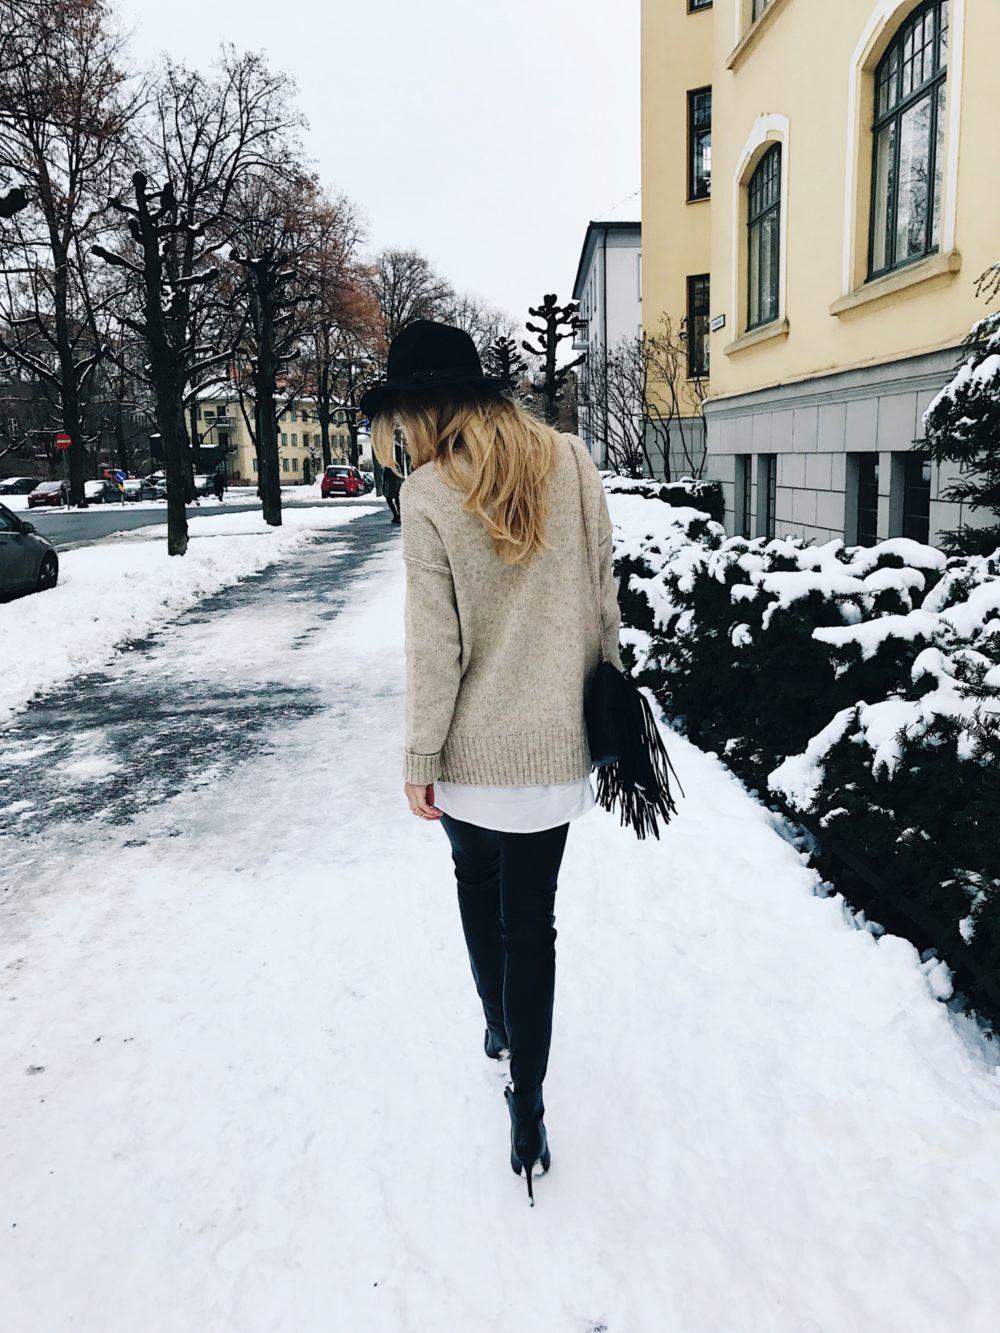 Sweater-Weather-7.jpg